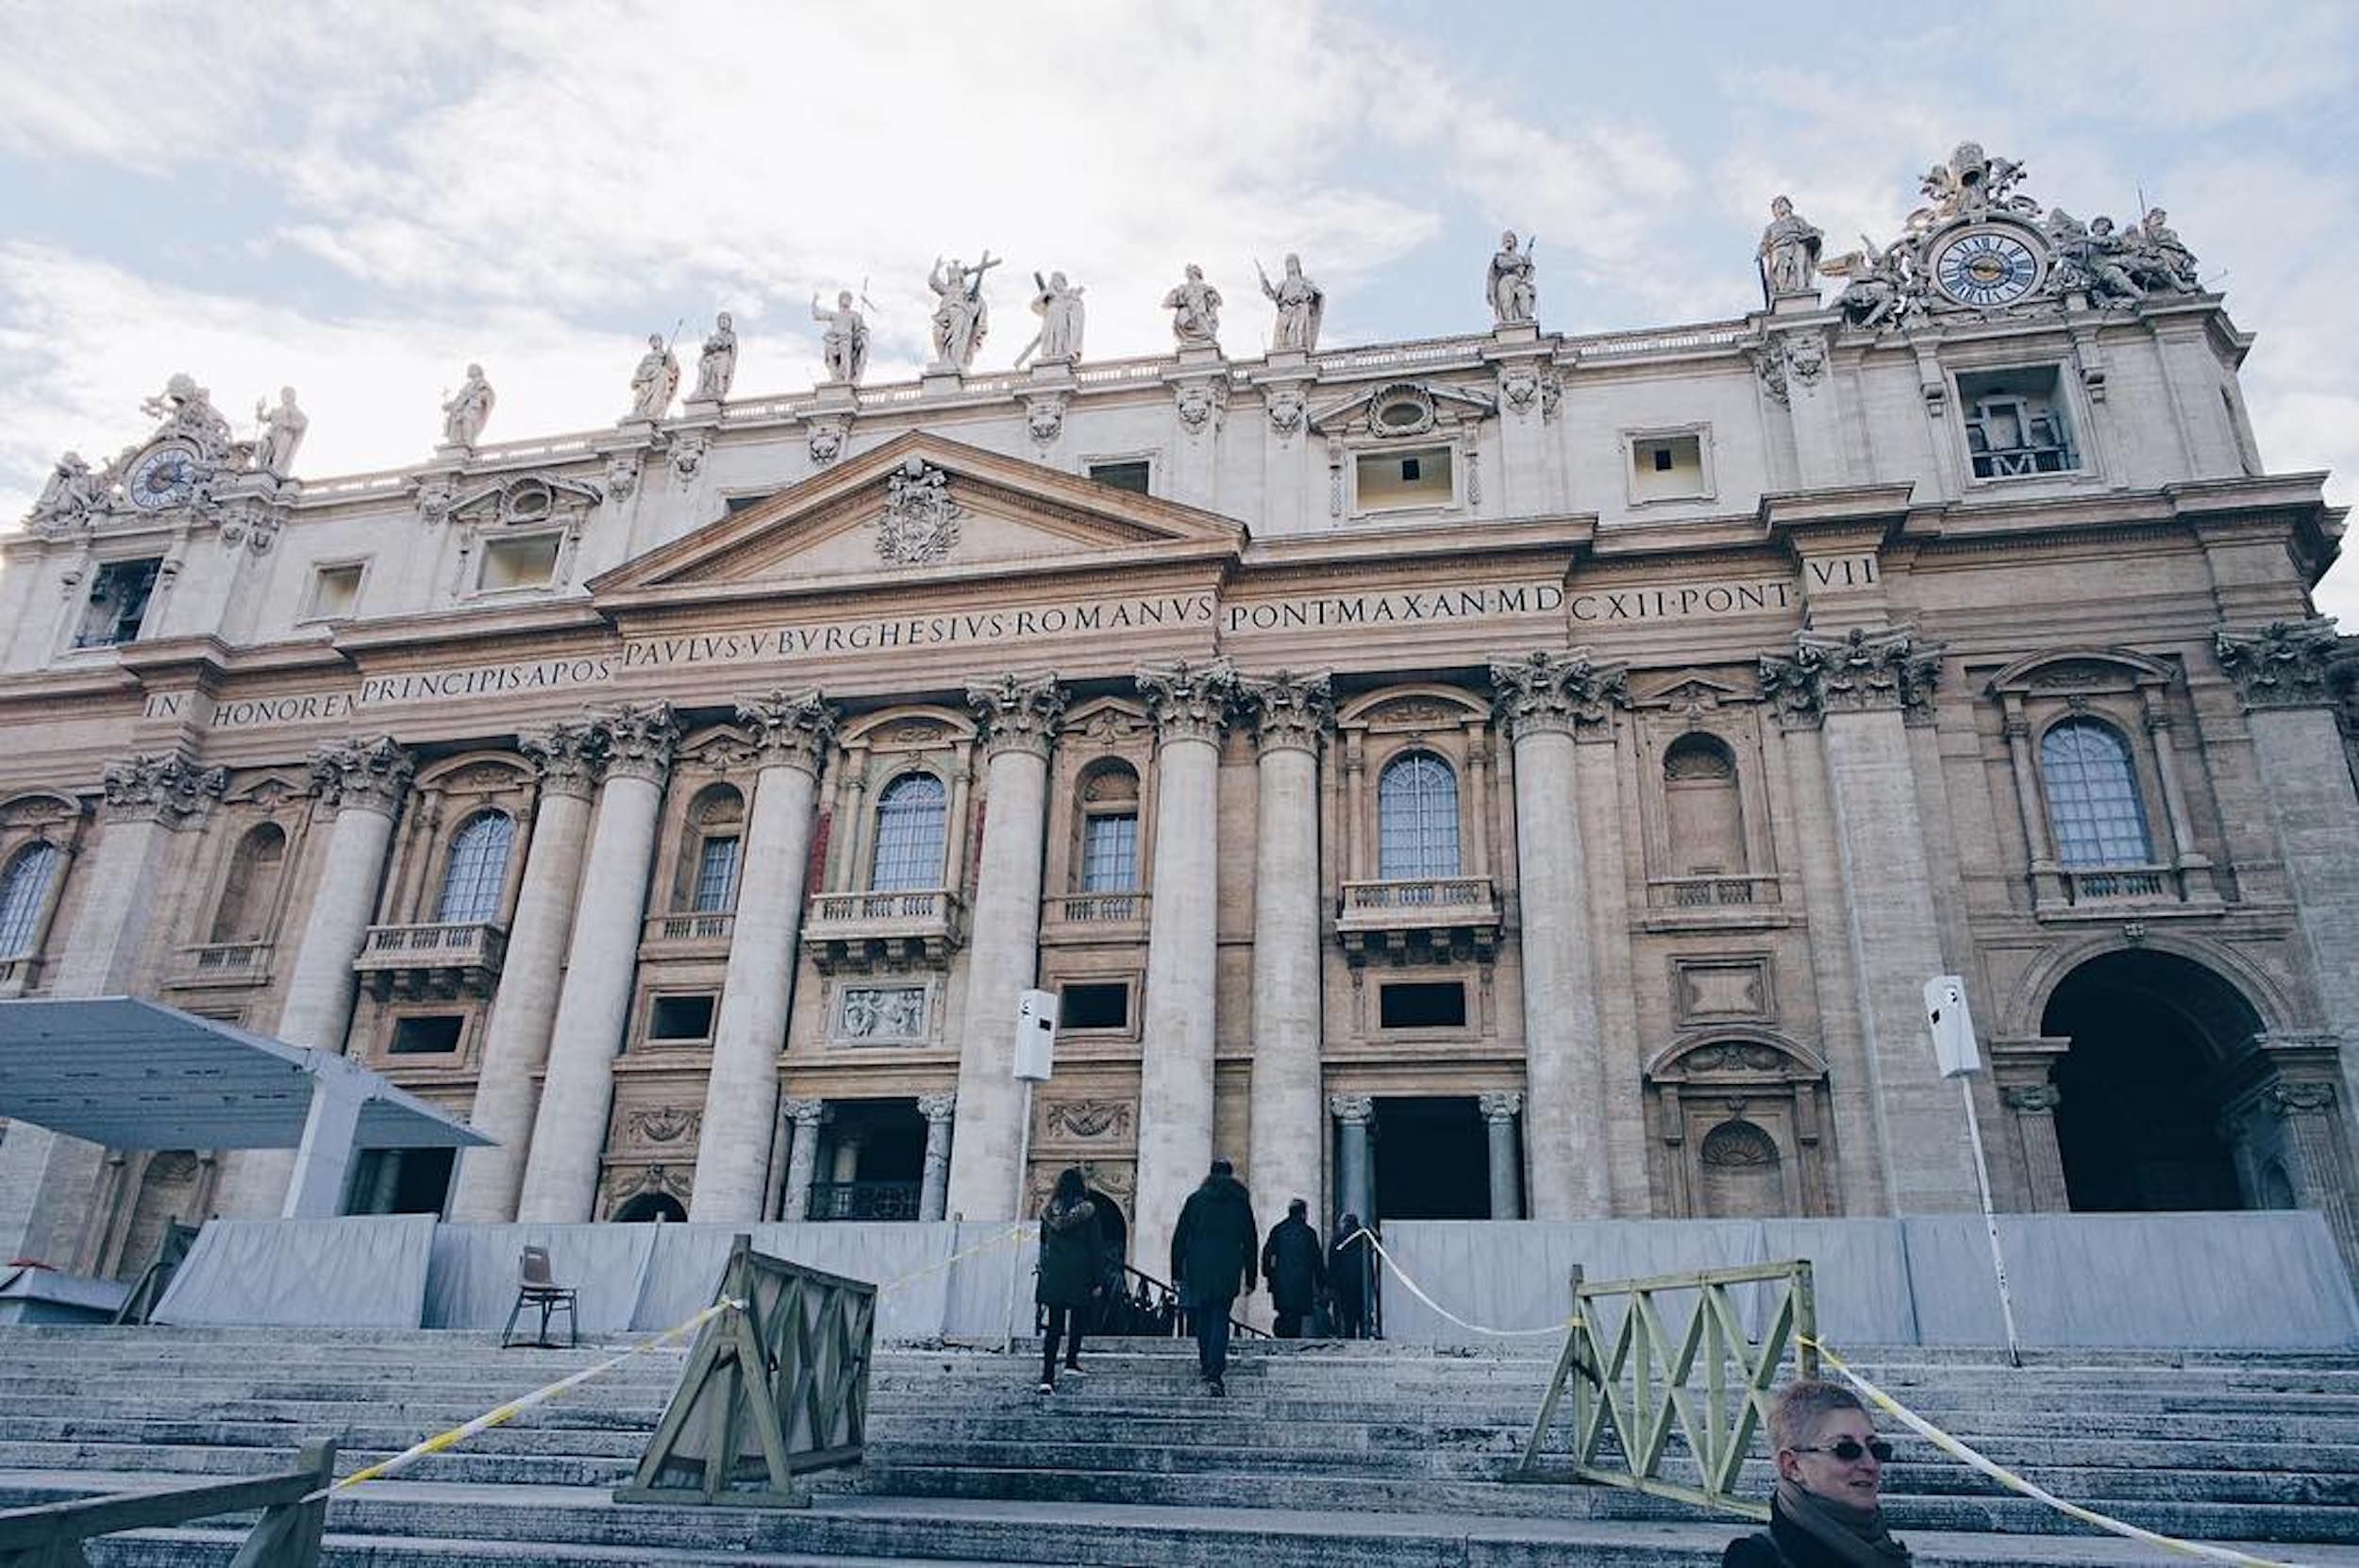 st-peter-basilica-rome-italy.jpg